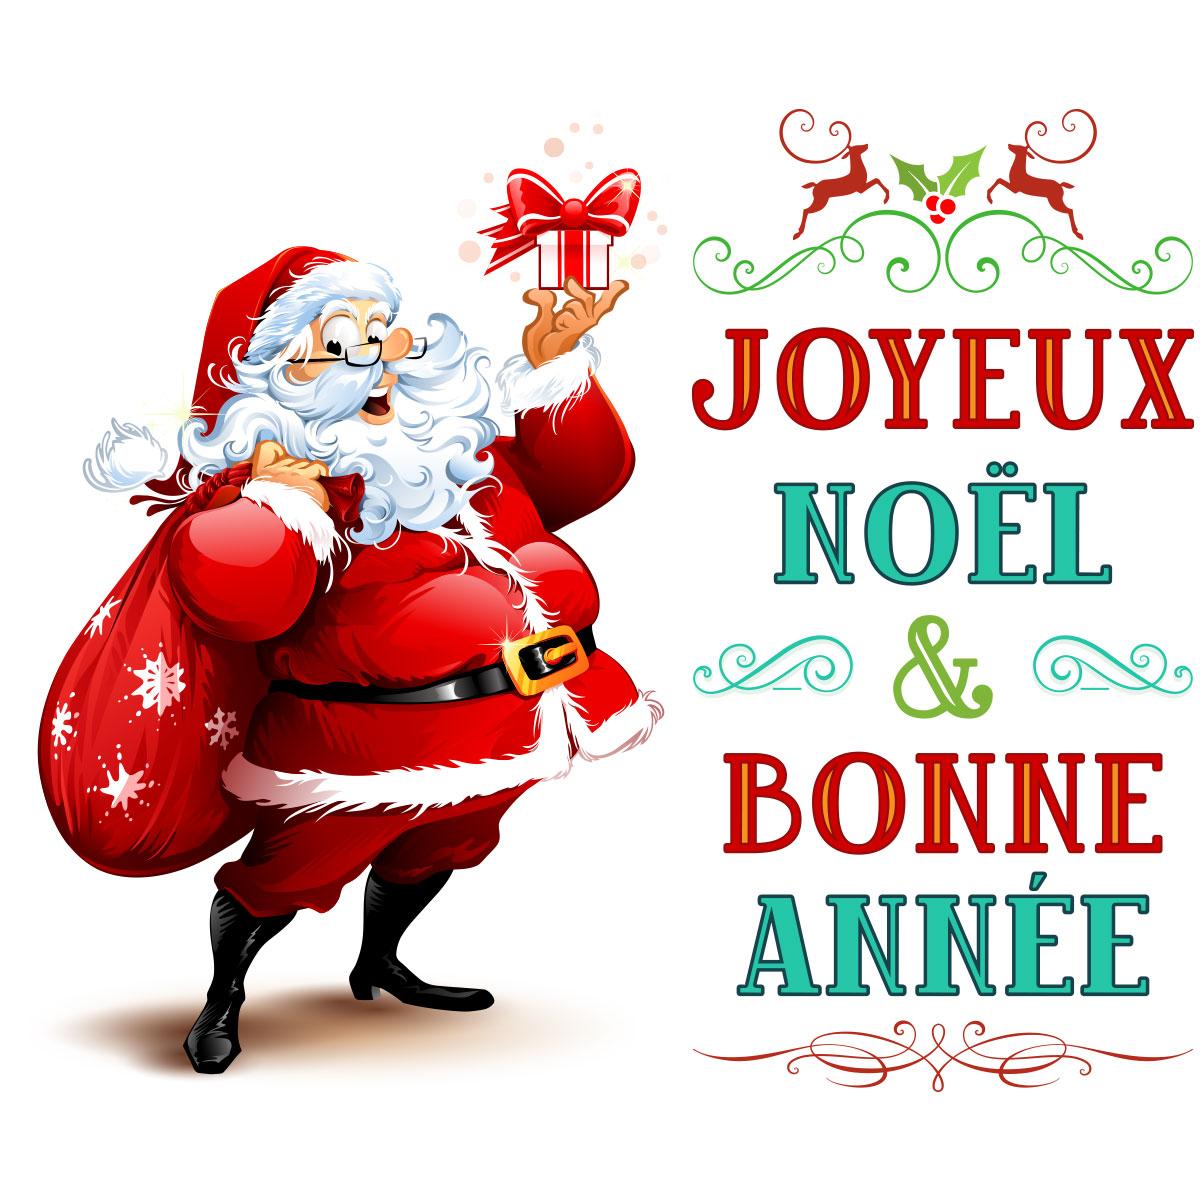 sticker-noel-pere-noel-joyeux-noel-et-bonne-annee-5-ambiance-sticker-col-inc_SAND_L104  - Librairie Carine